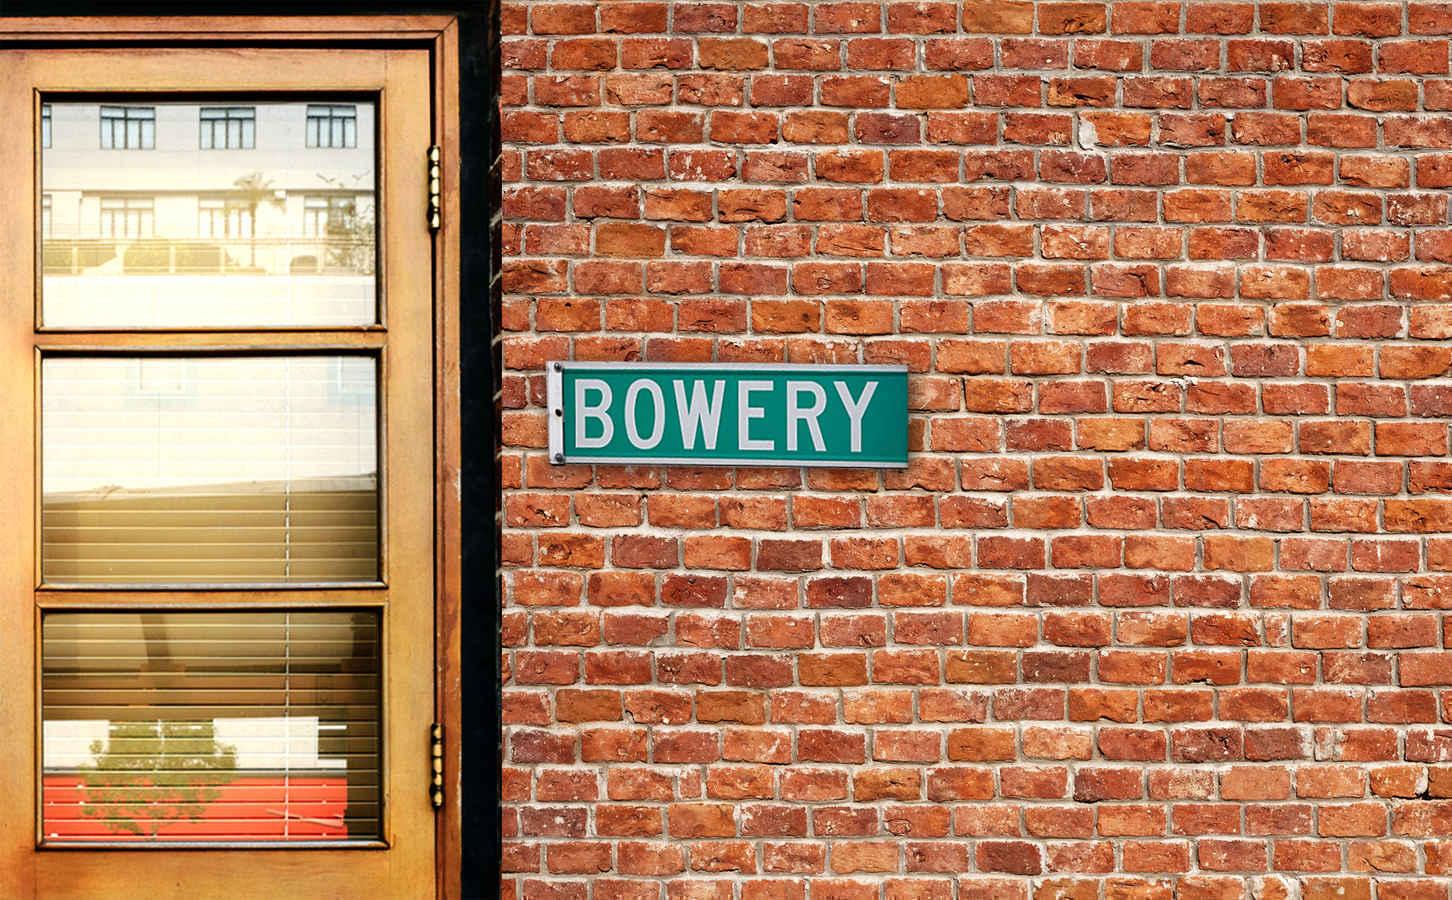 Bowery Street Sign, Manhattan, New York